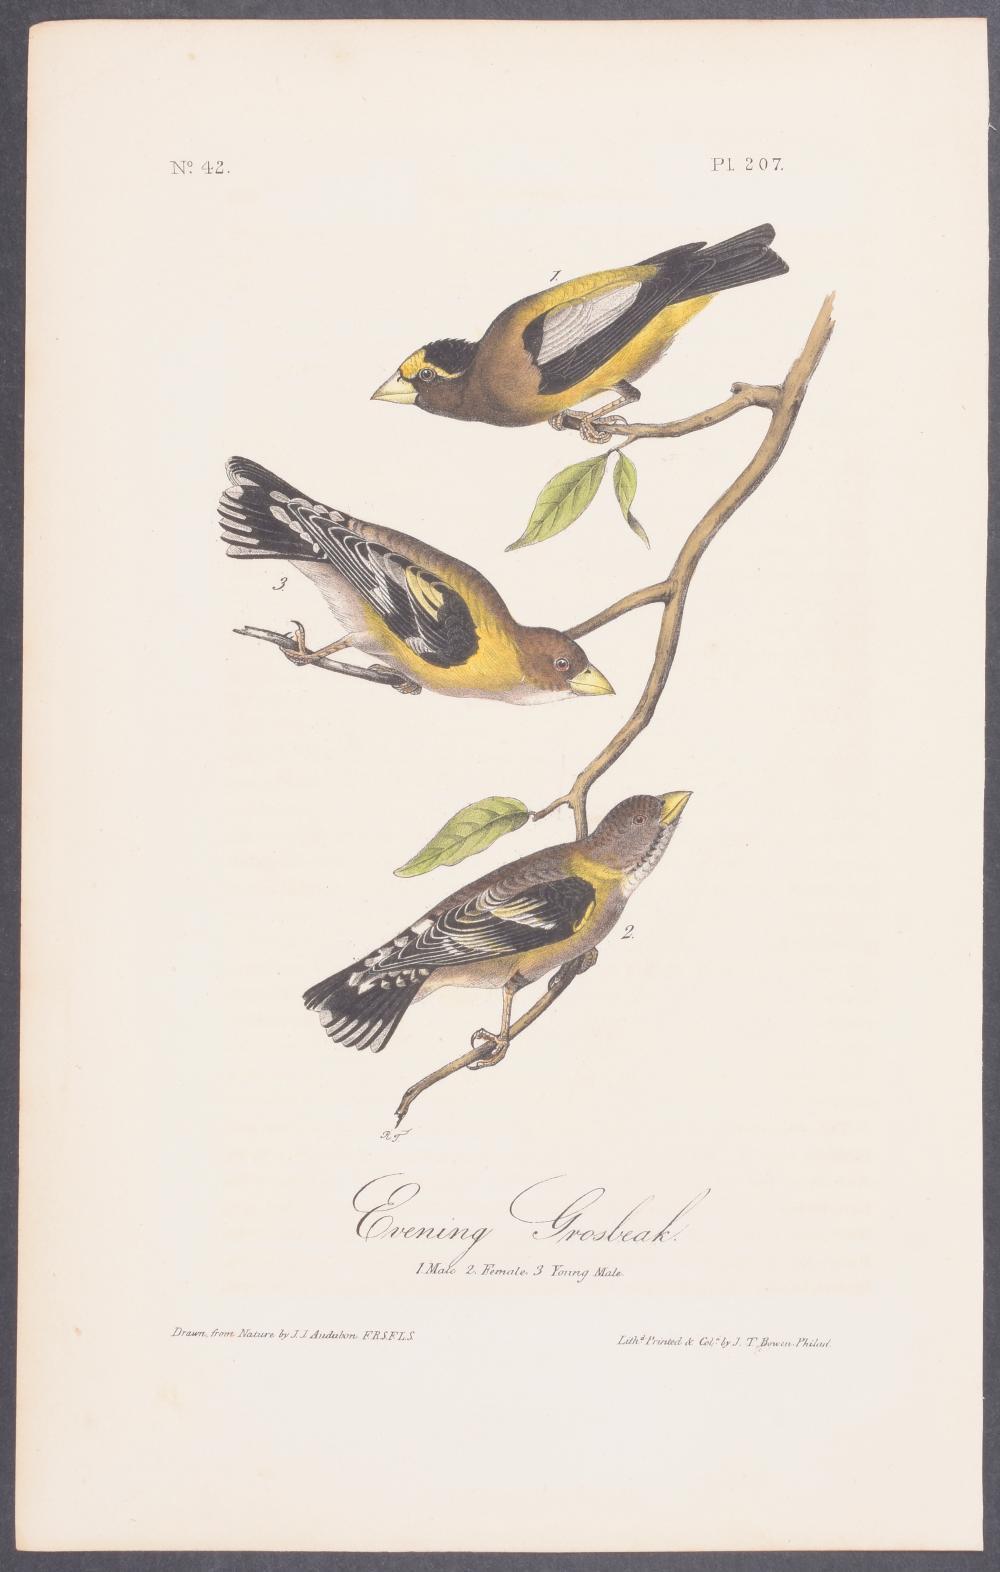 Lot 11100: Audubon - Evening Grosbeak. 207